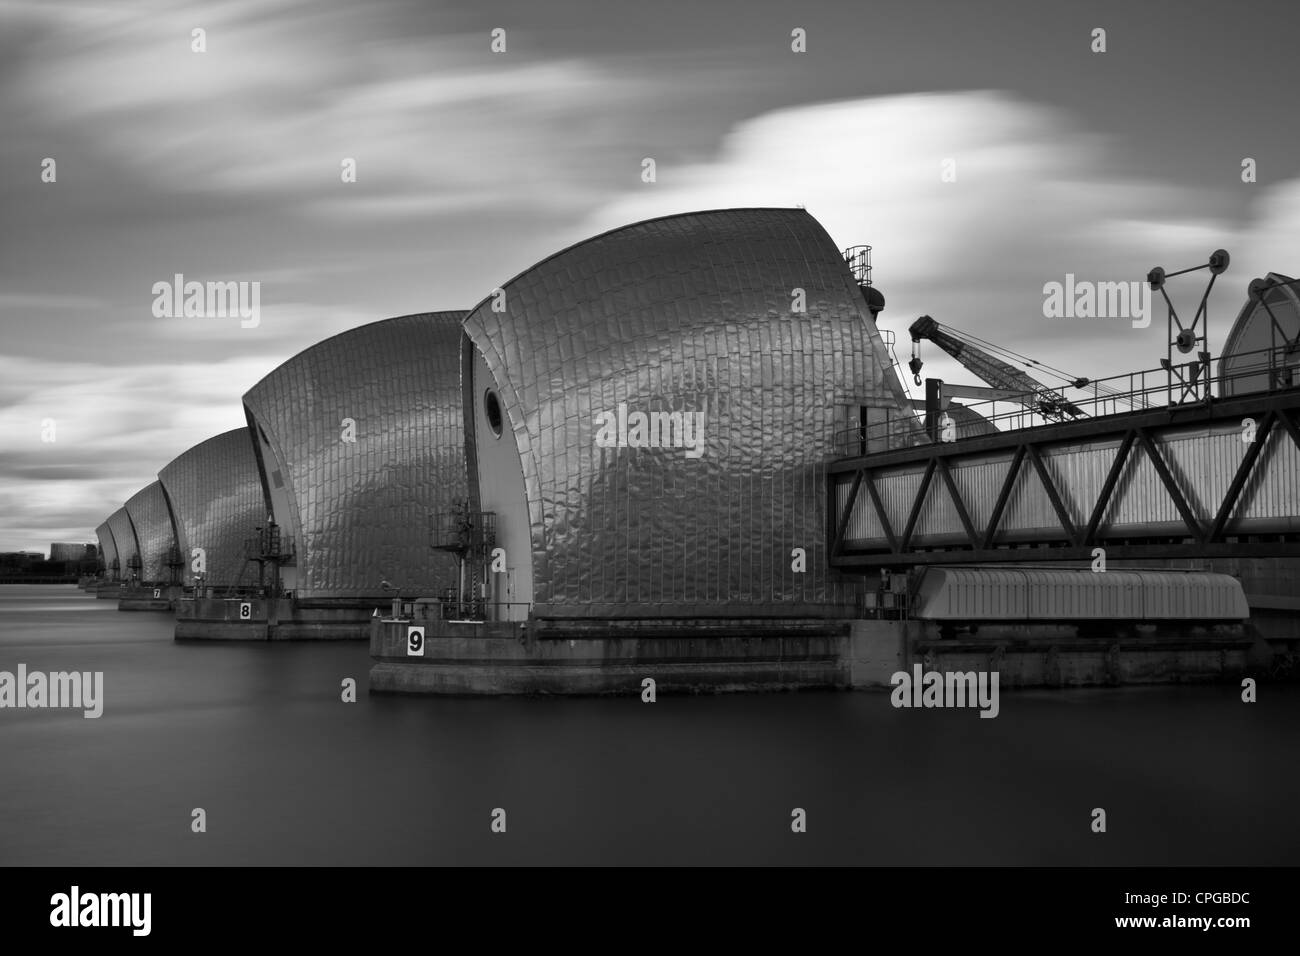 The River Thames Flood Barrier, London, England - Stock Image